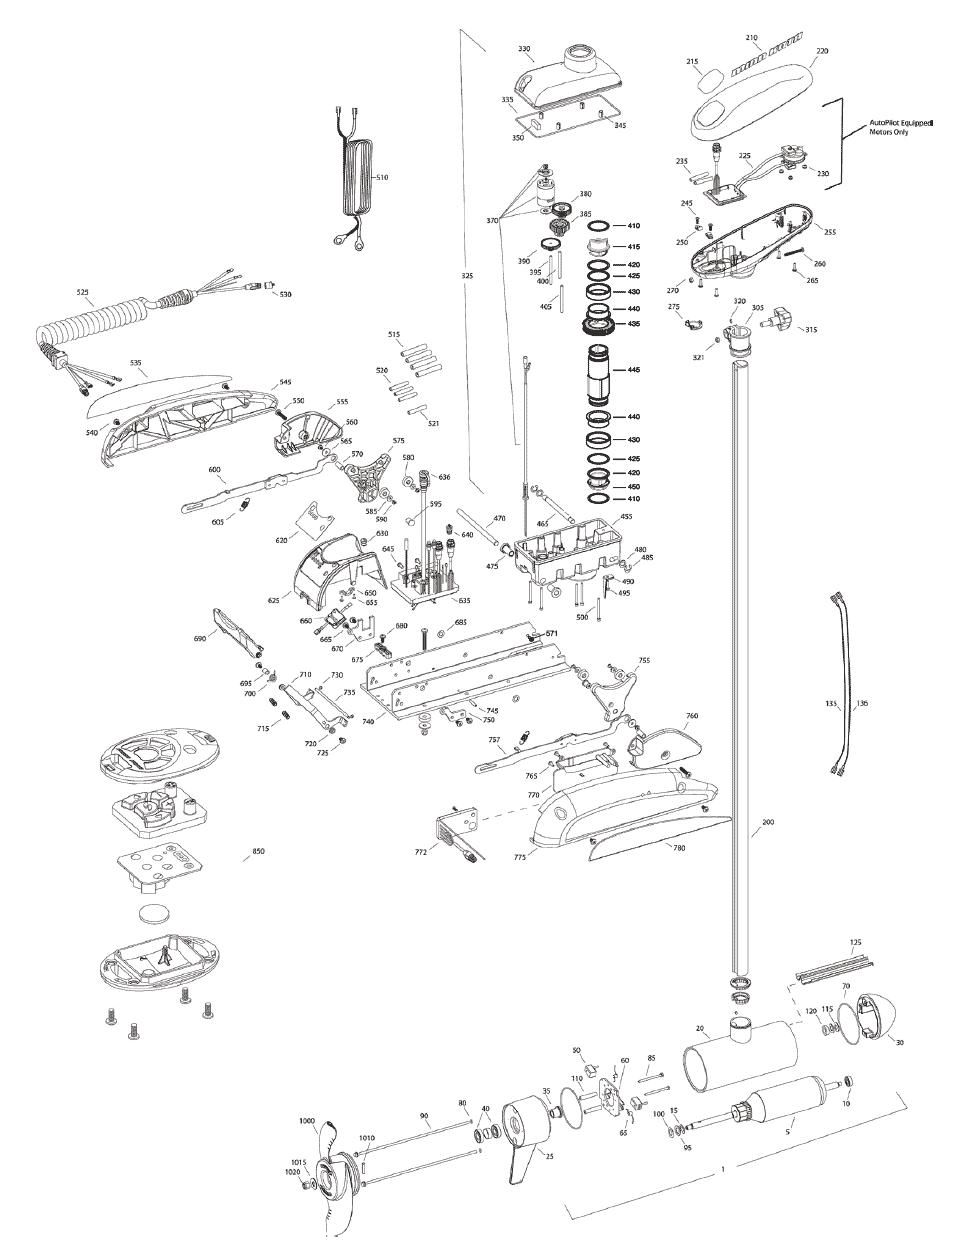 minn kota riptide 80 st parts 2015 from. Black Bedroom Furniture Sets. Home Design Ideas